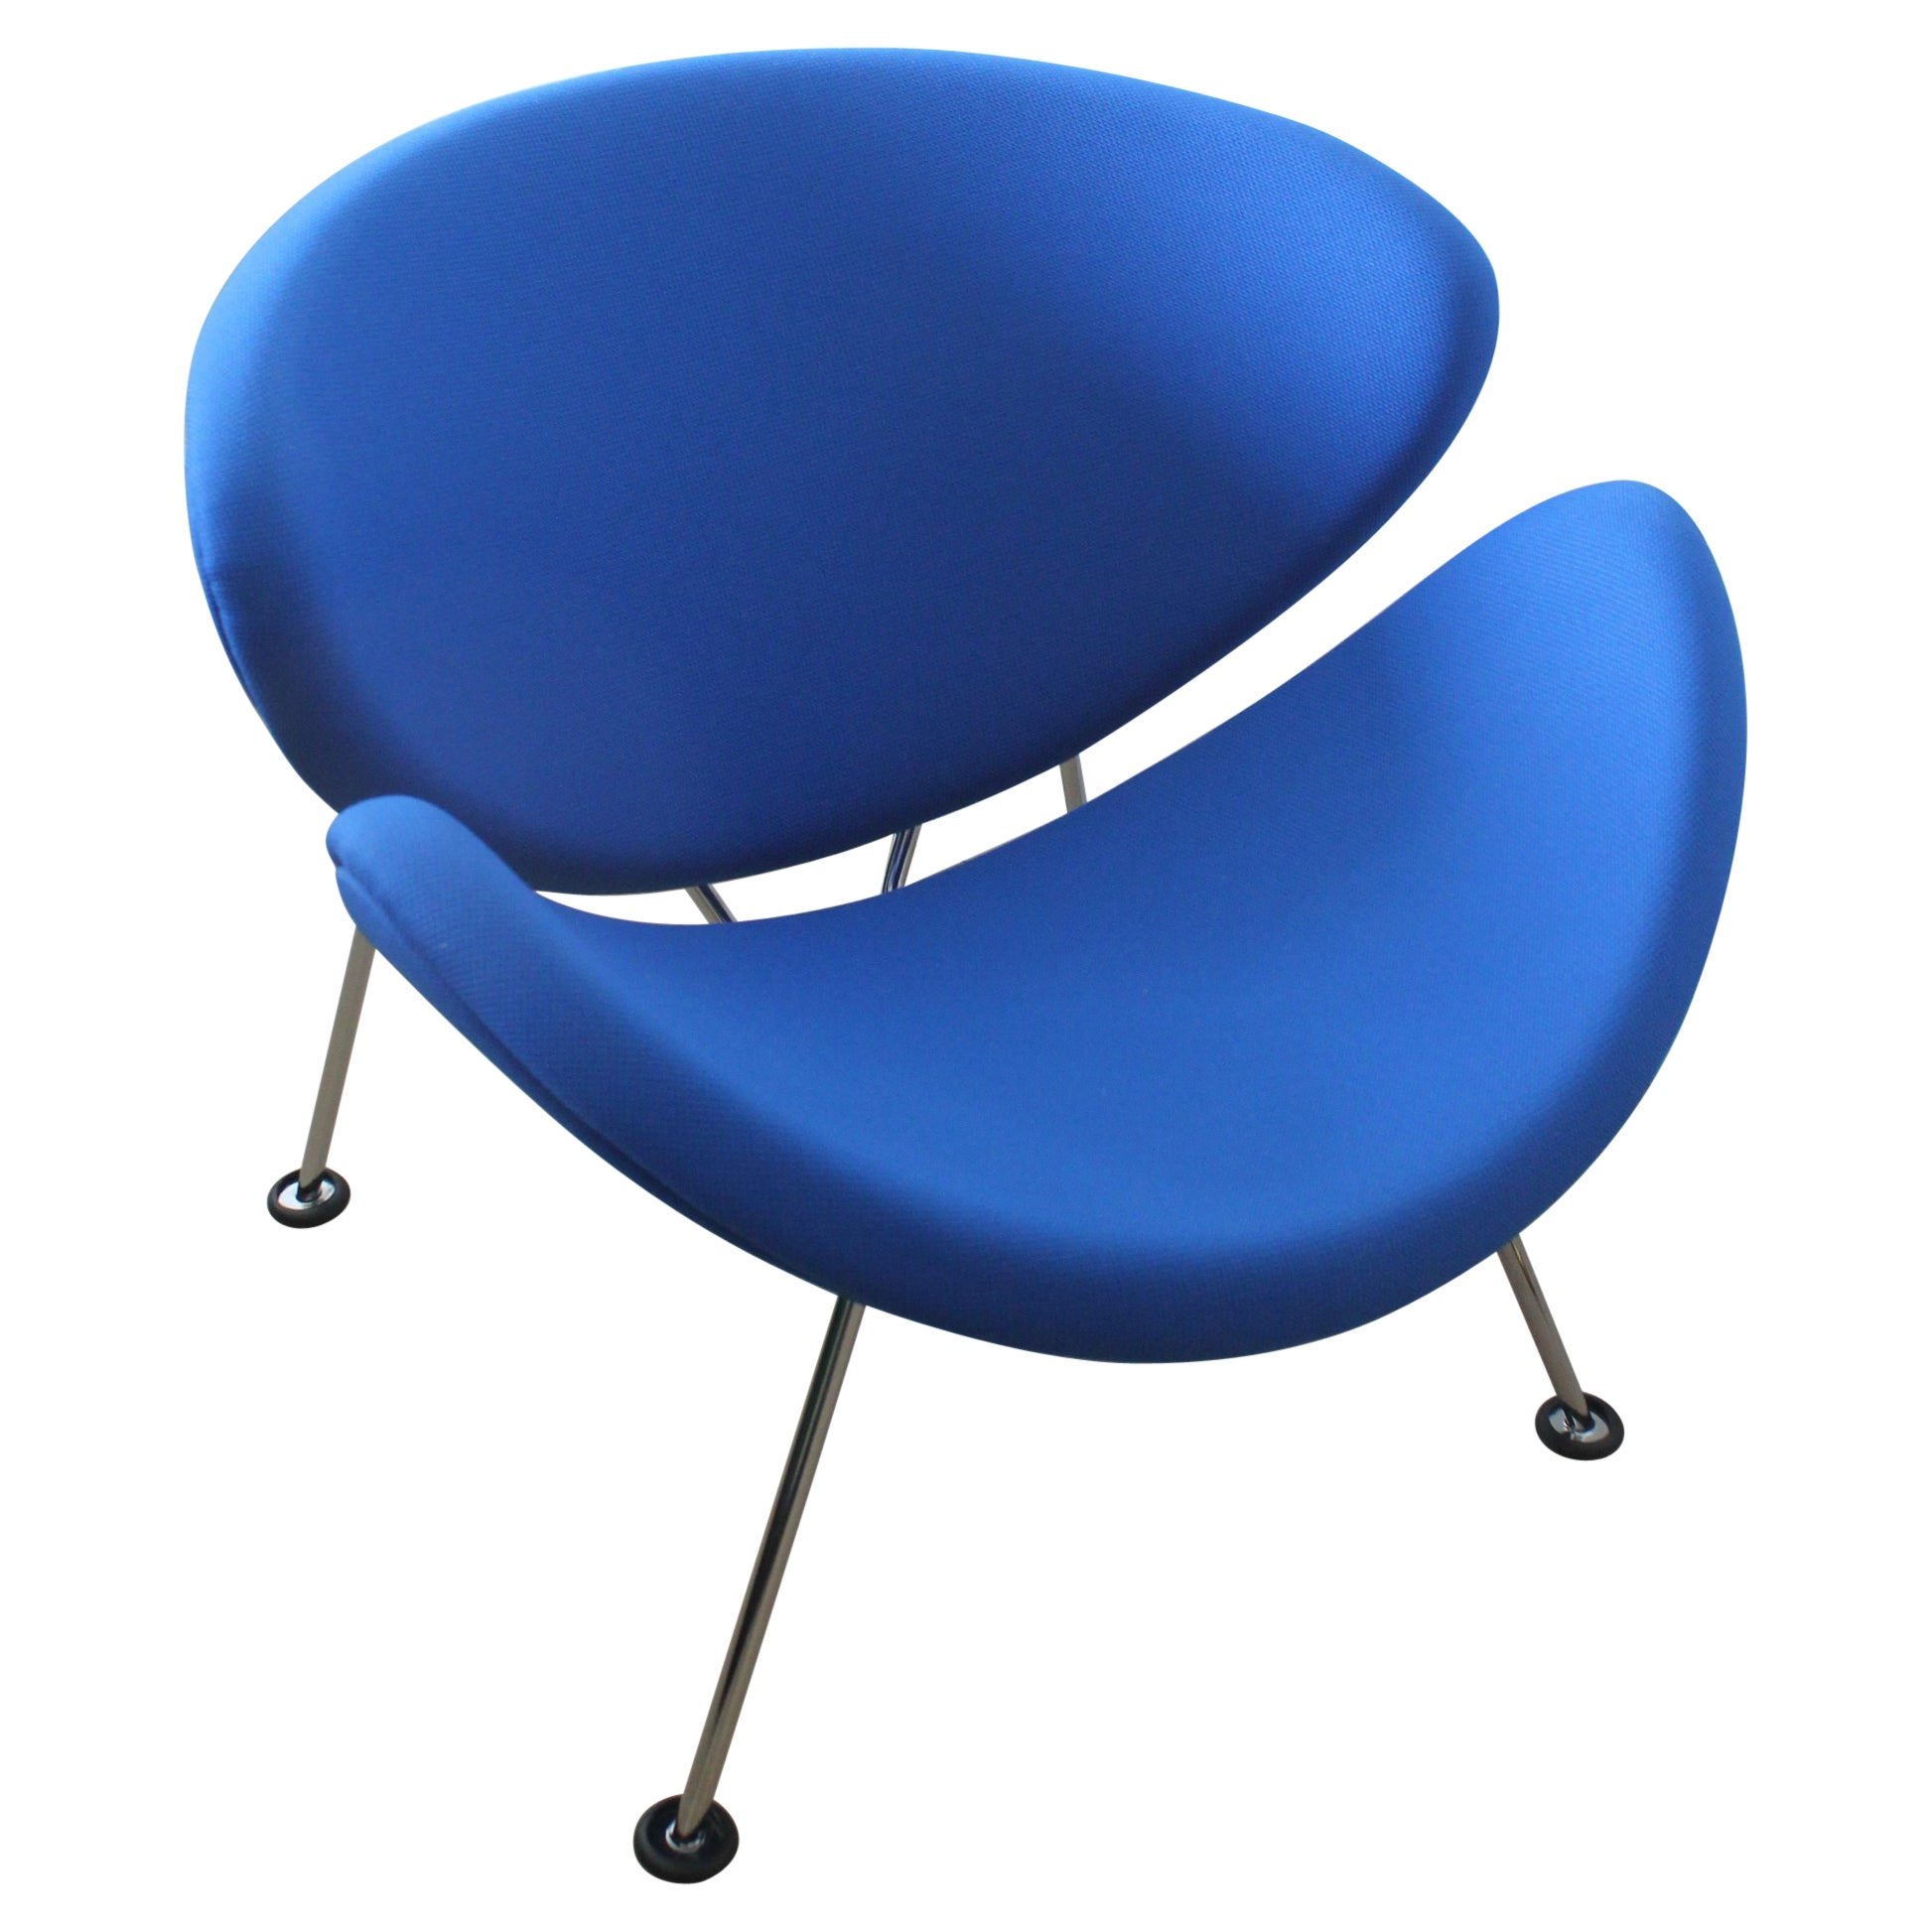 Artifort Orange Slice Blue Junior Chair by Pierre Paulin